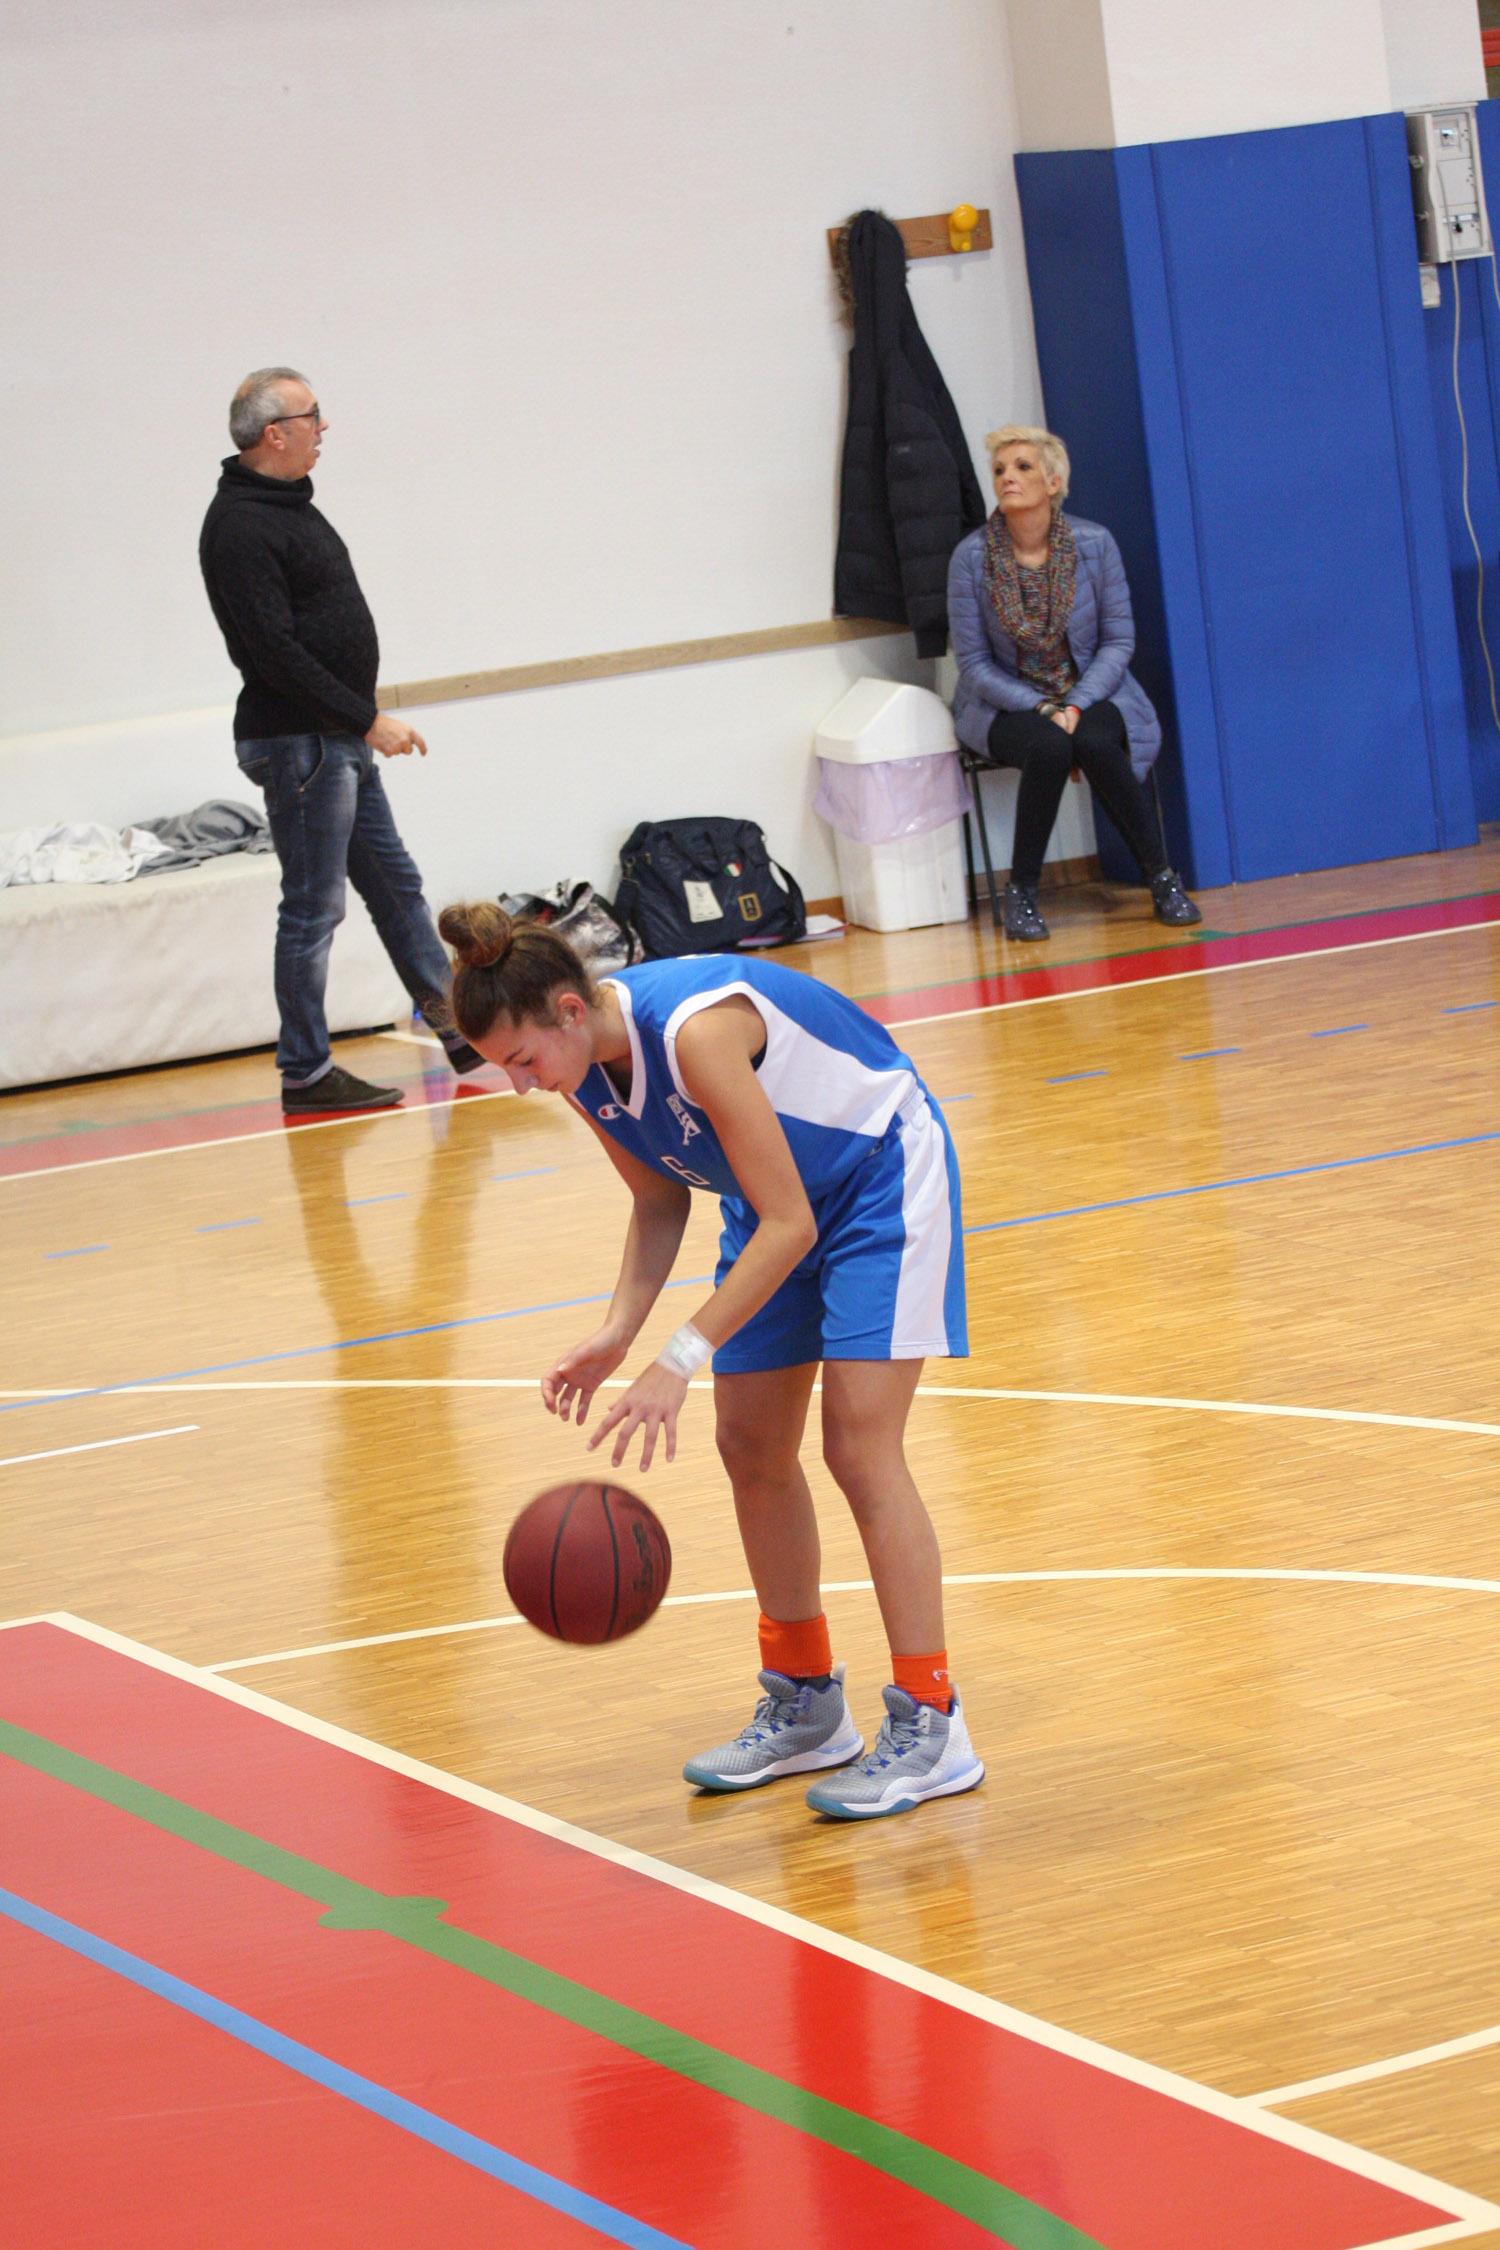 U16E - Costa Masnaga vs Baskettiamo Vittuone 2001 00010.jpg